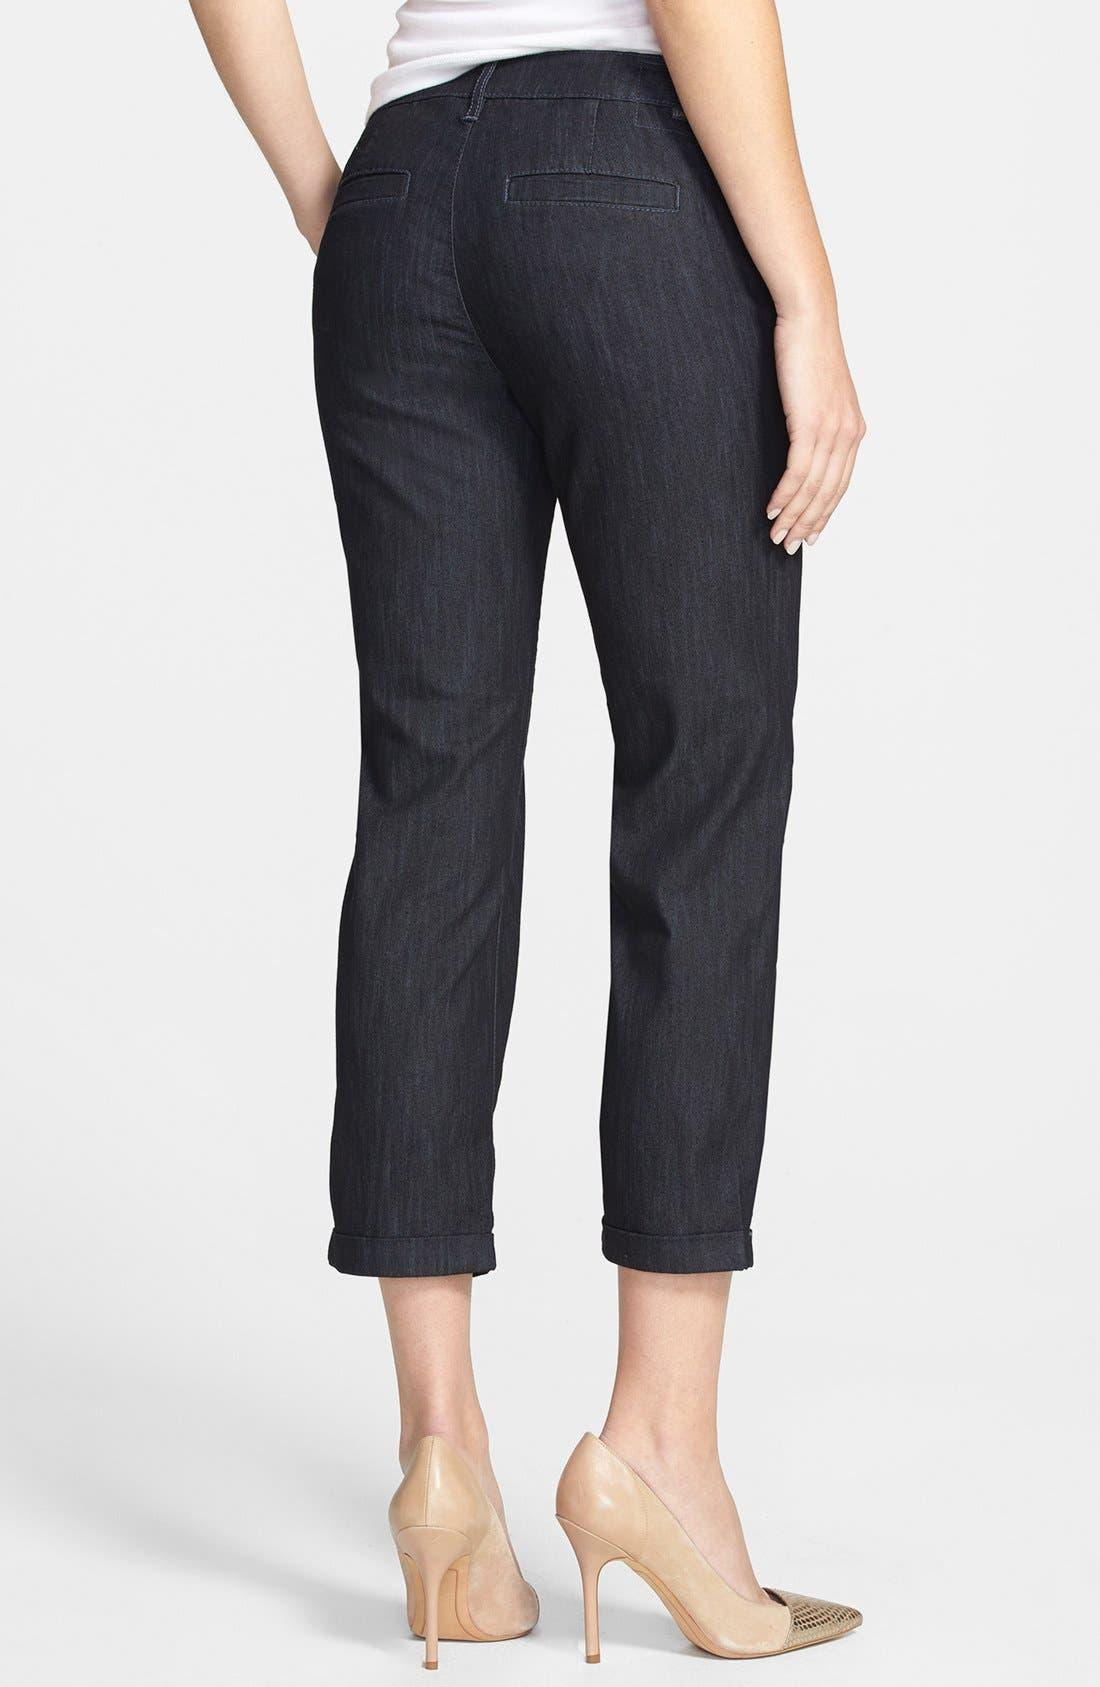 Alternate Image 2  - Jag Jeans 'Cora' Stretch Crop Slim Leg Jeans (Dark Storm)